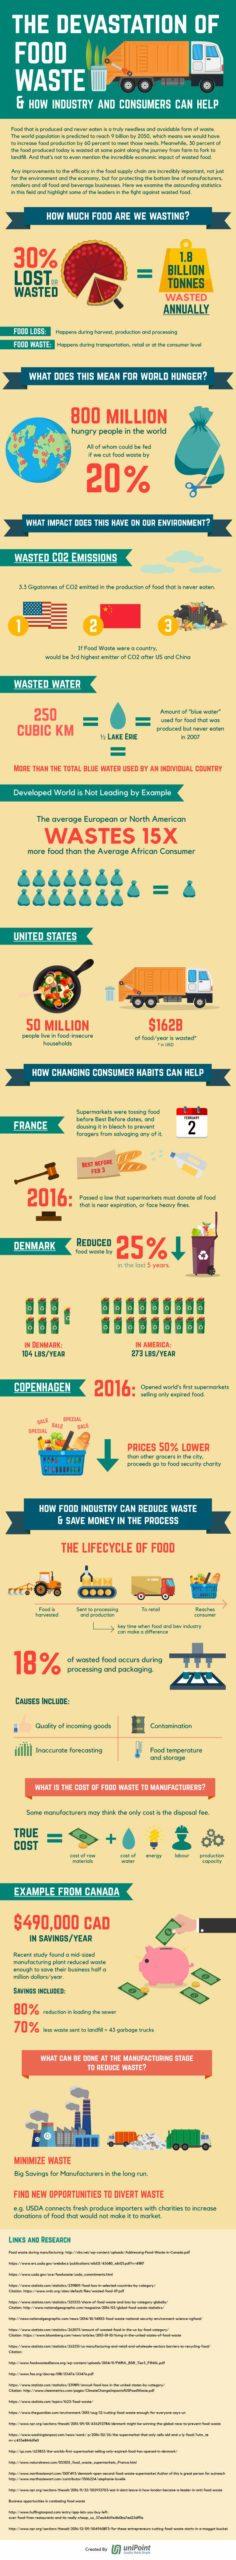 Devastation-of-Food-Waste